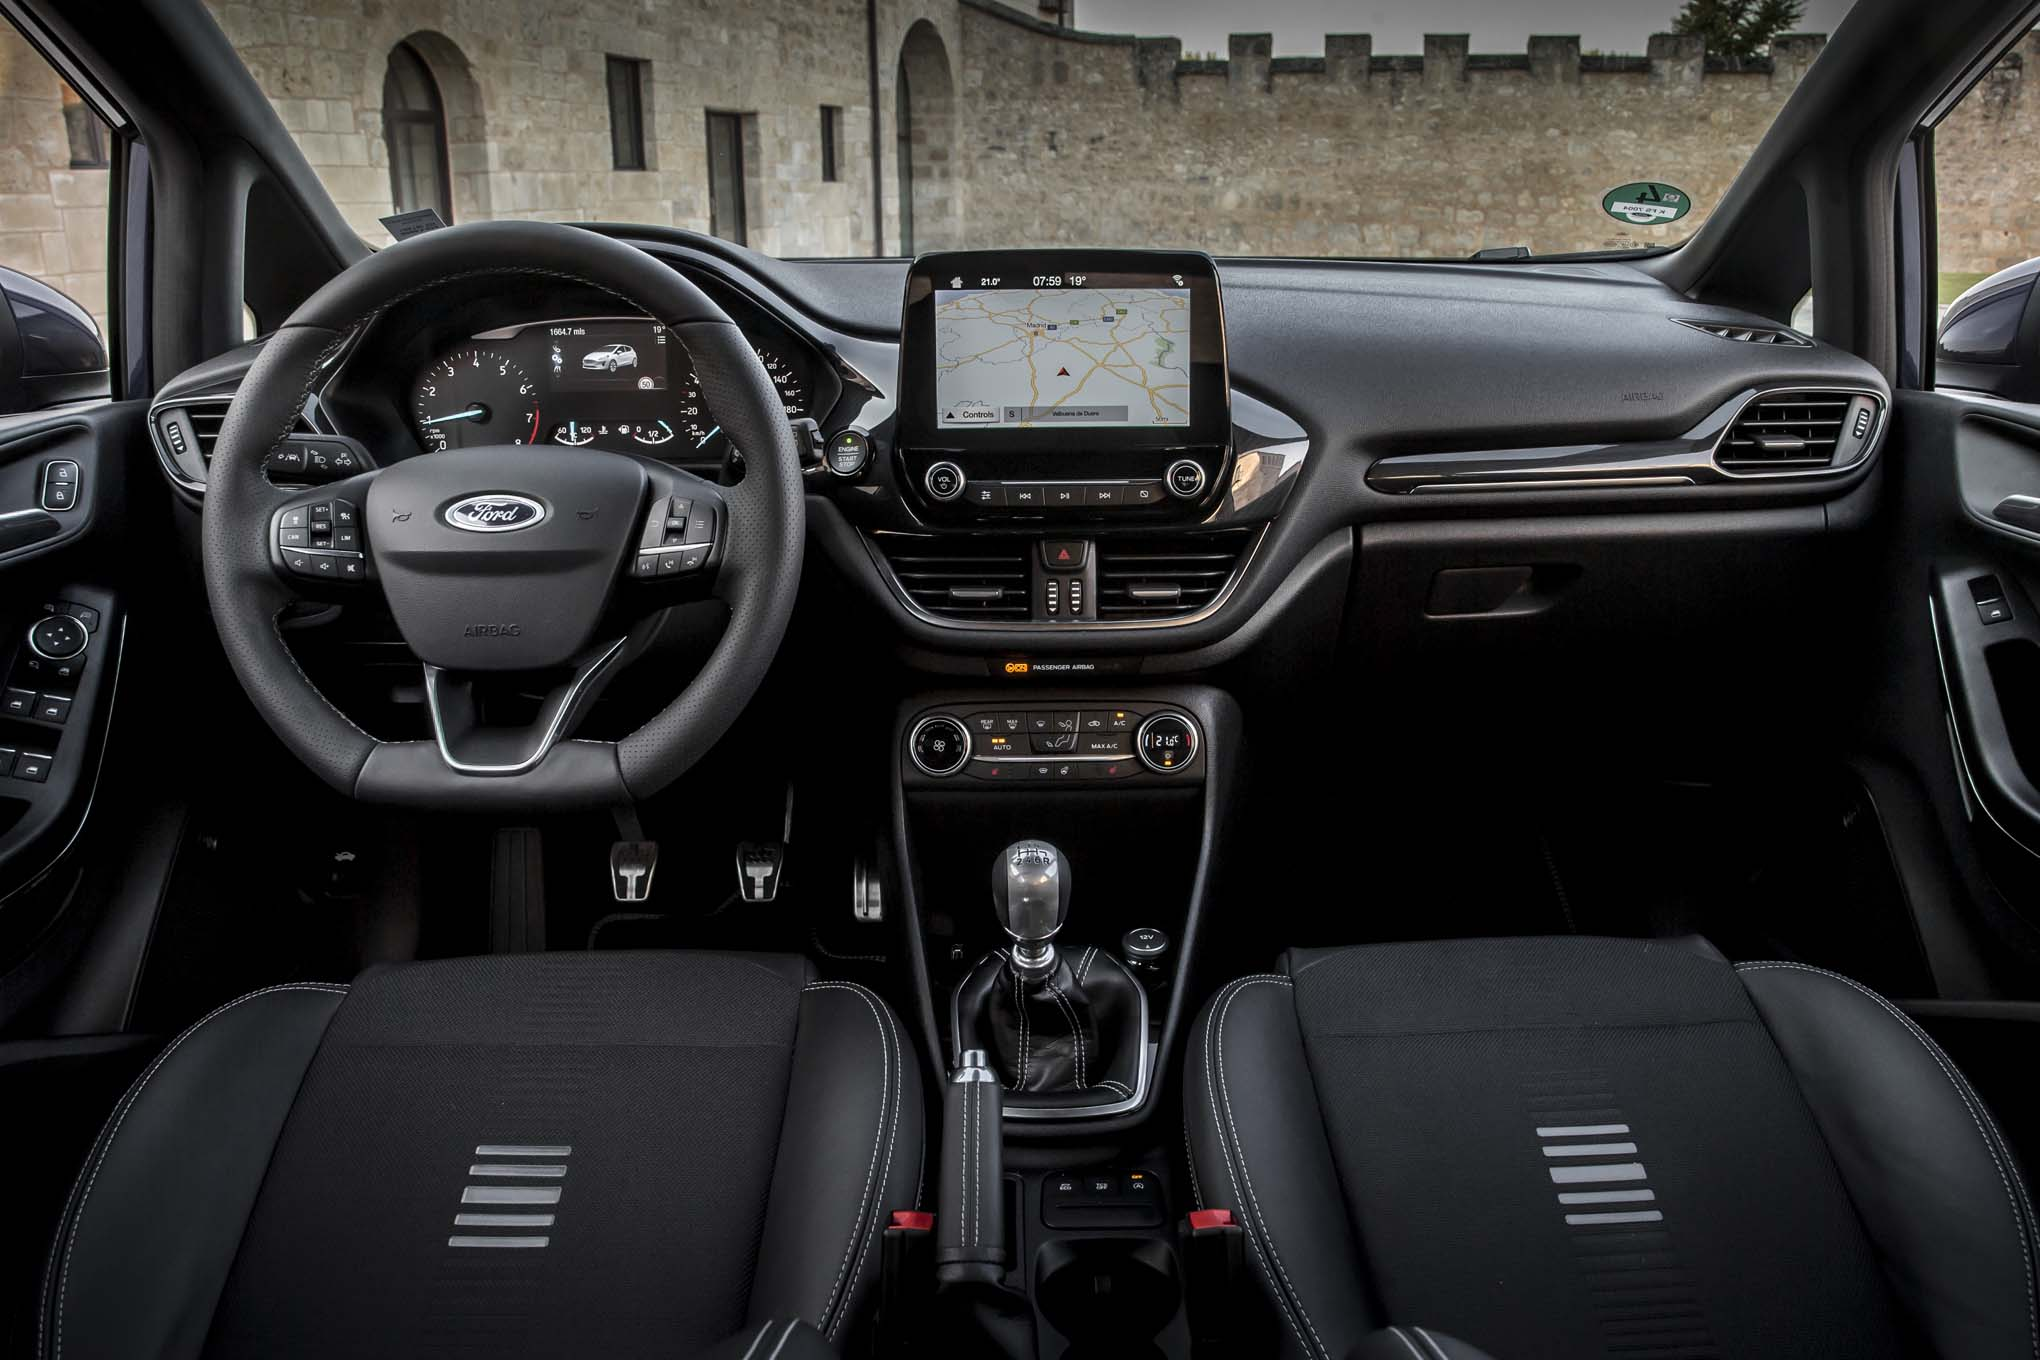 2018 Ford Focus Price And Interior Noorcars Com